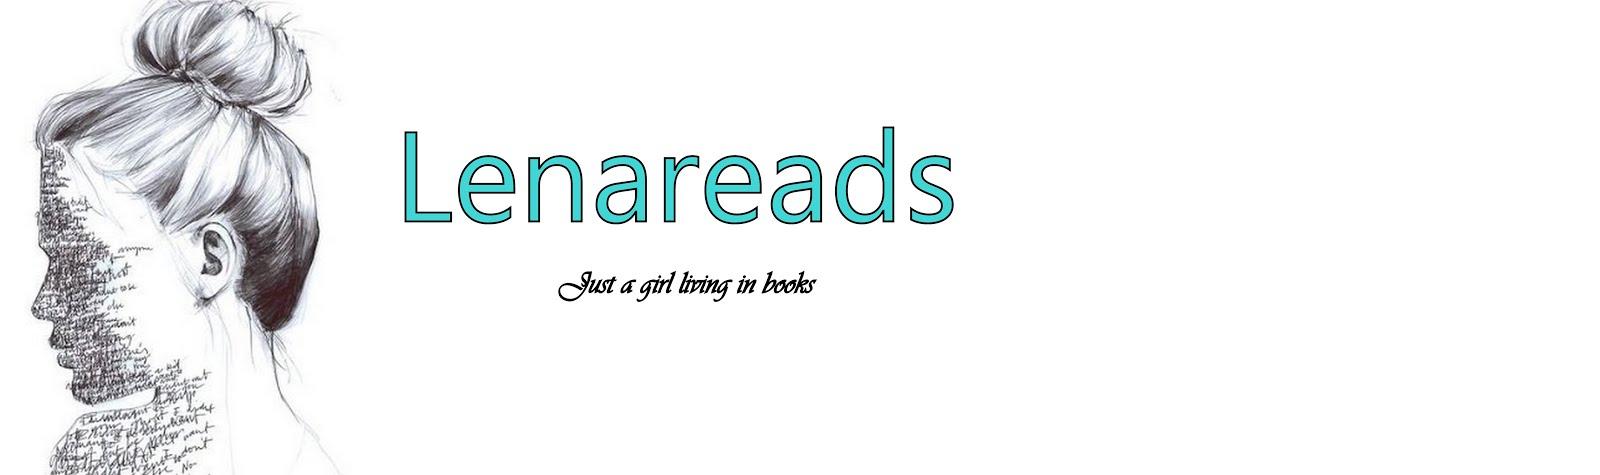 Lenareads